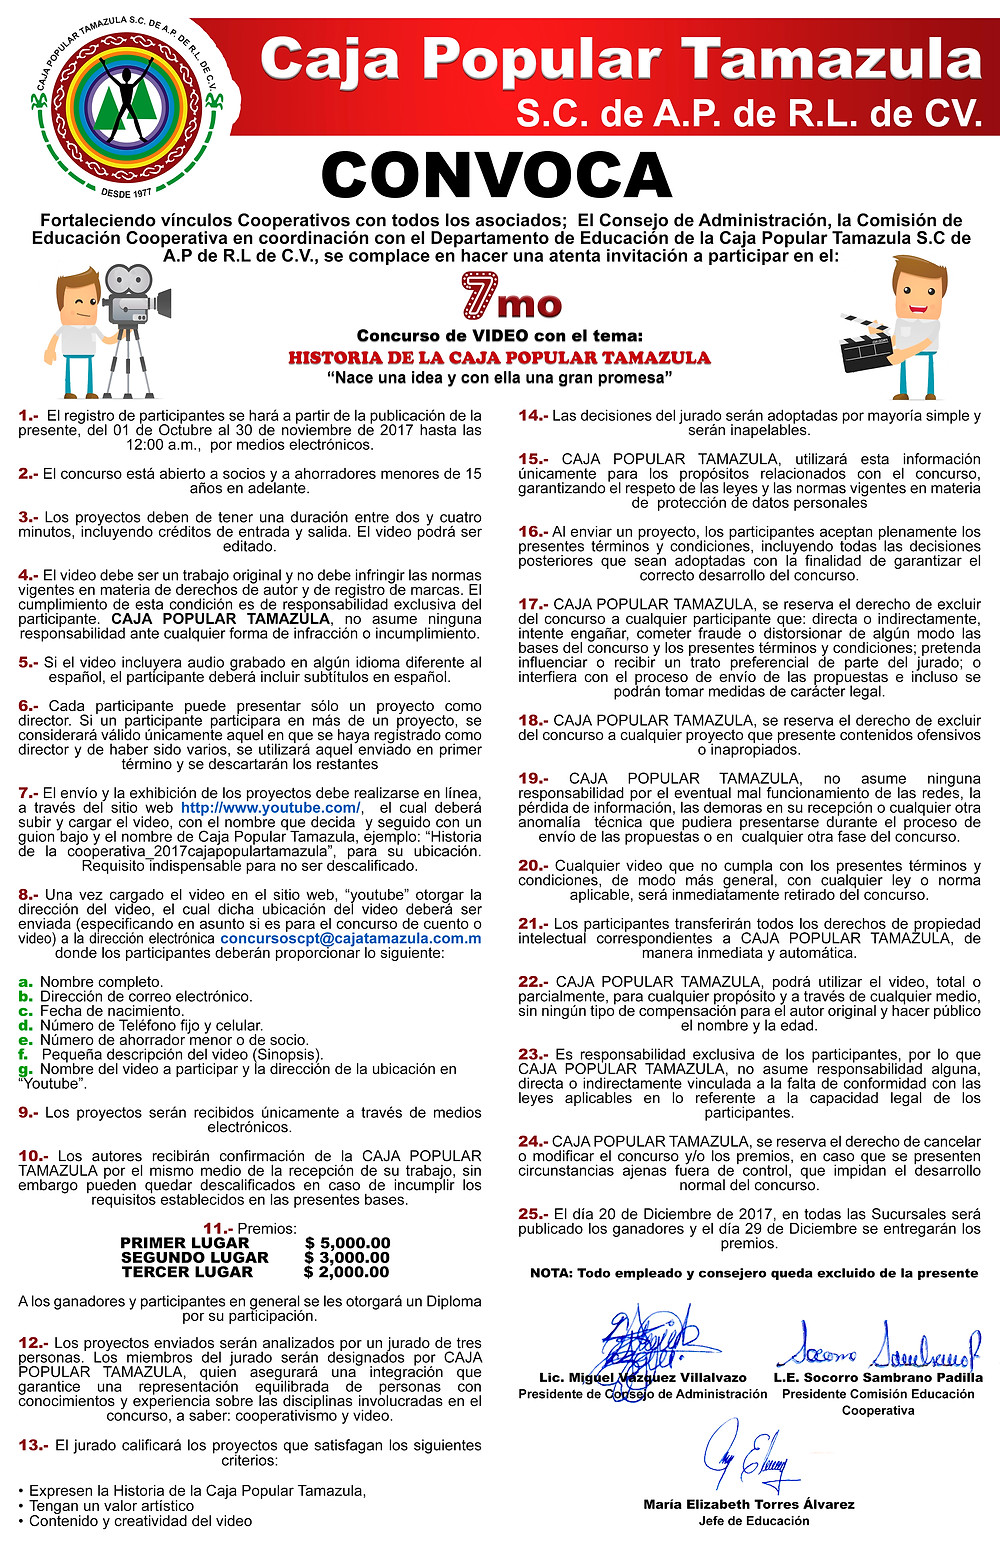 "Participa en la Convocatoria del 7mo Concurso de Video ""Historia de la Caja Popular Tamazula"""